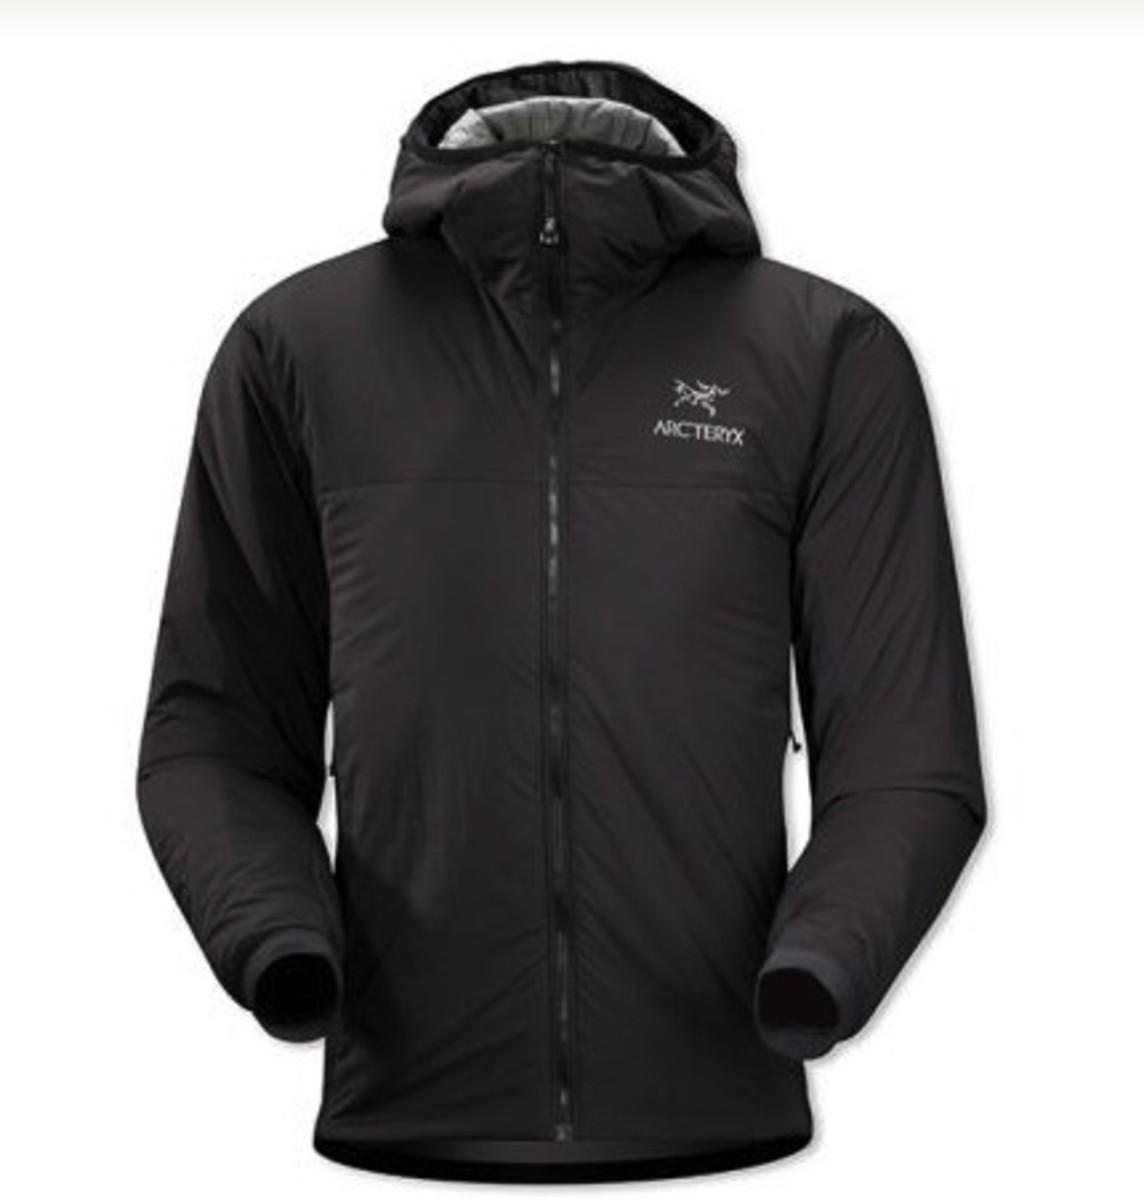 Arcteryx Atom LT Hooded Insulated Jacket